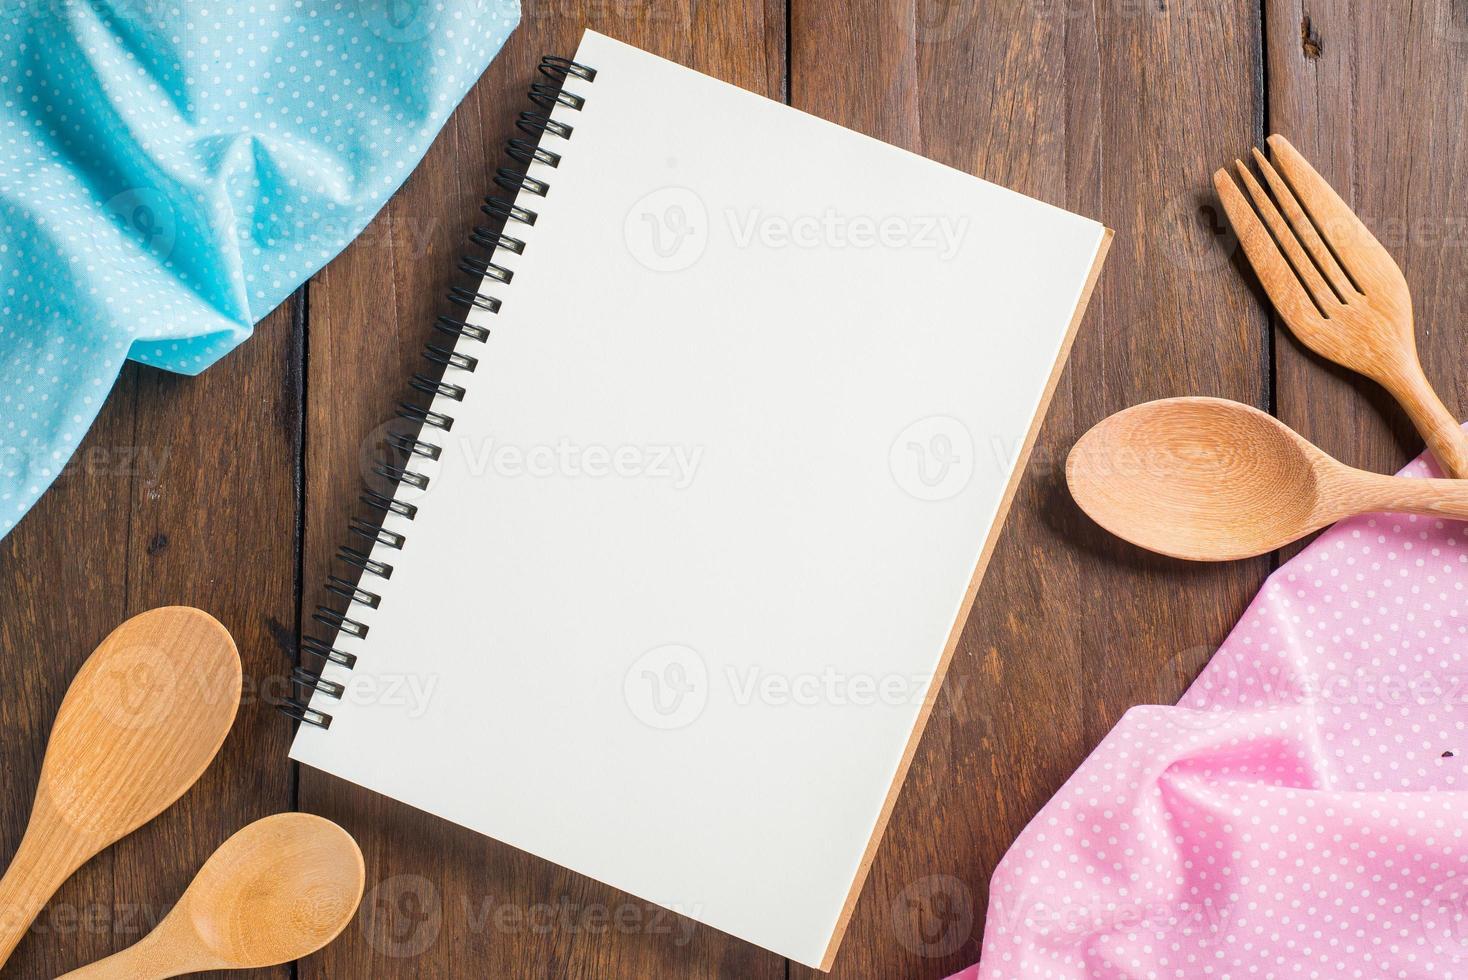 recept anteckningsbok, sked, gaffel på trä bakgrund foto